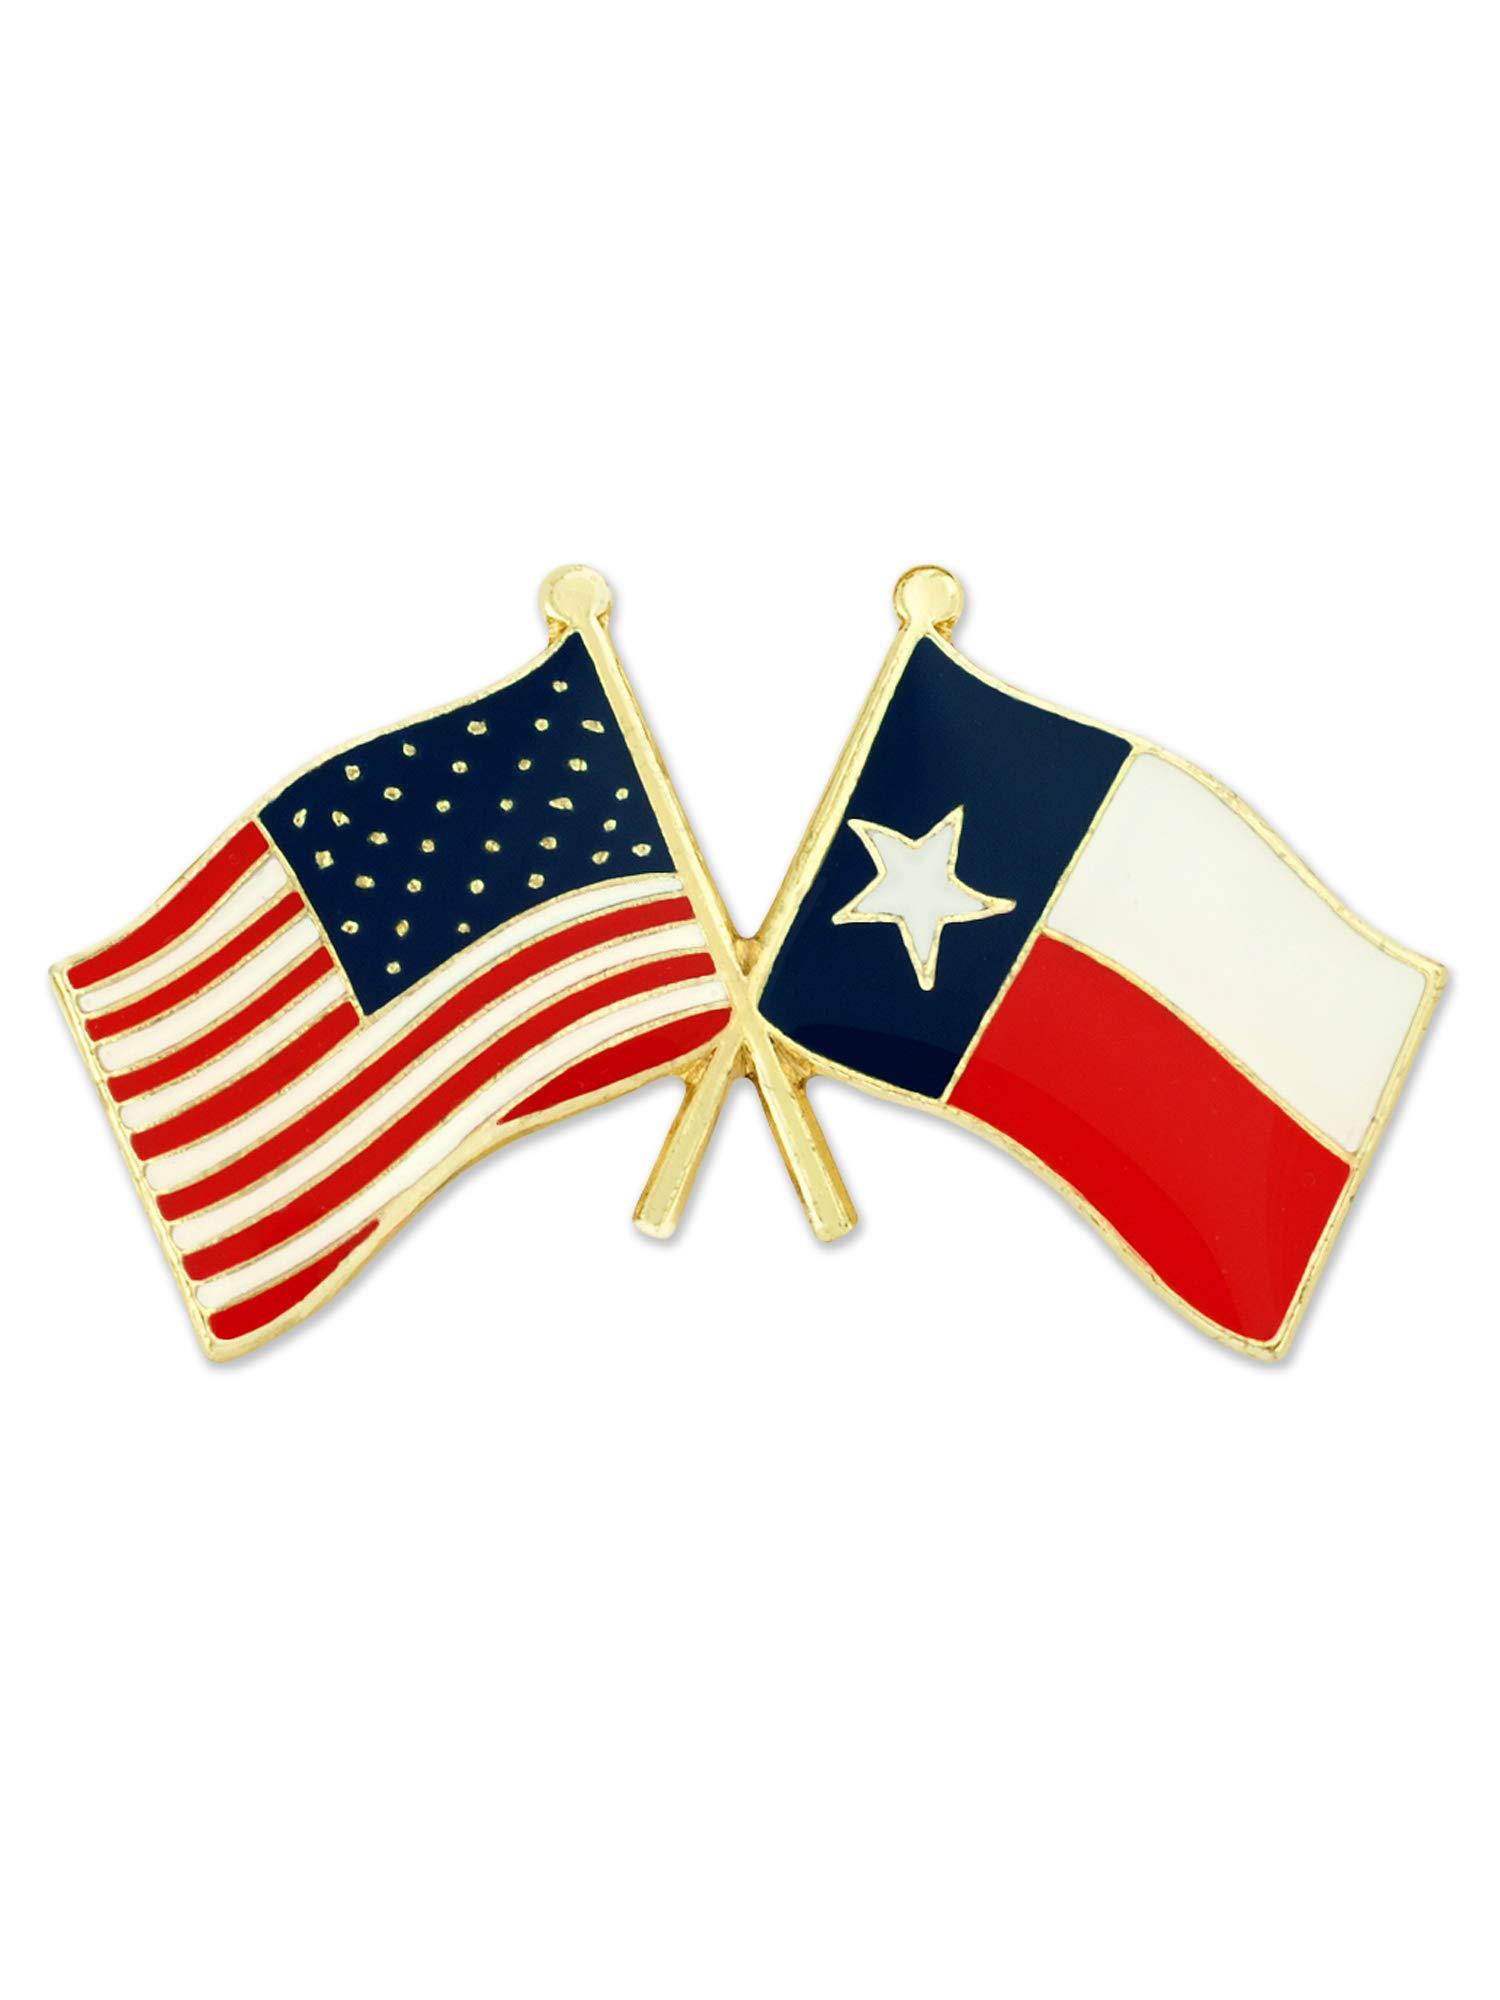 PinMart Texas and USA Crossed Friendship Flag Enamel Lapel Pin